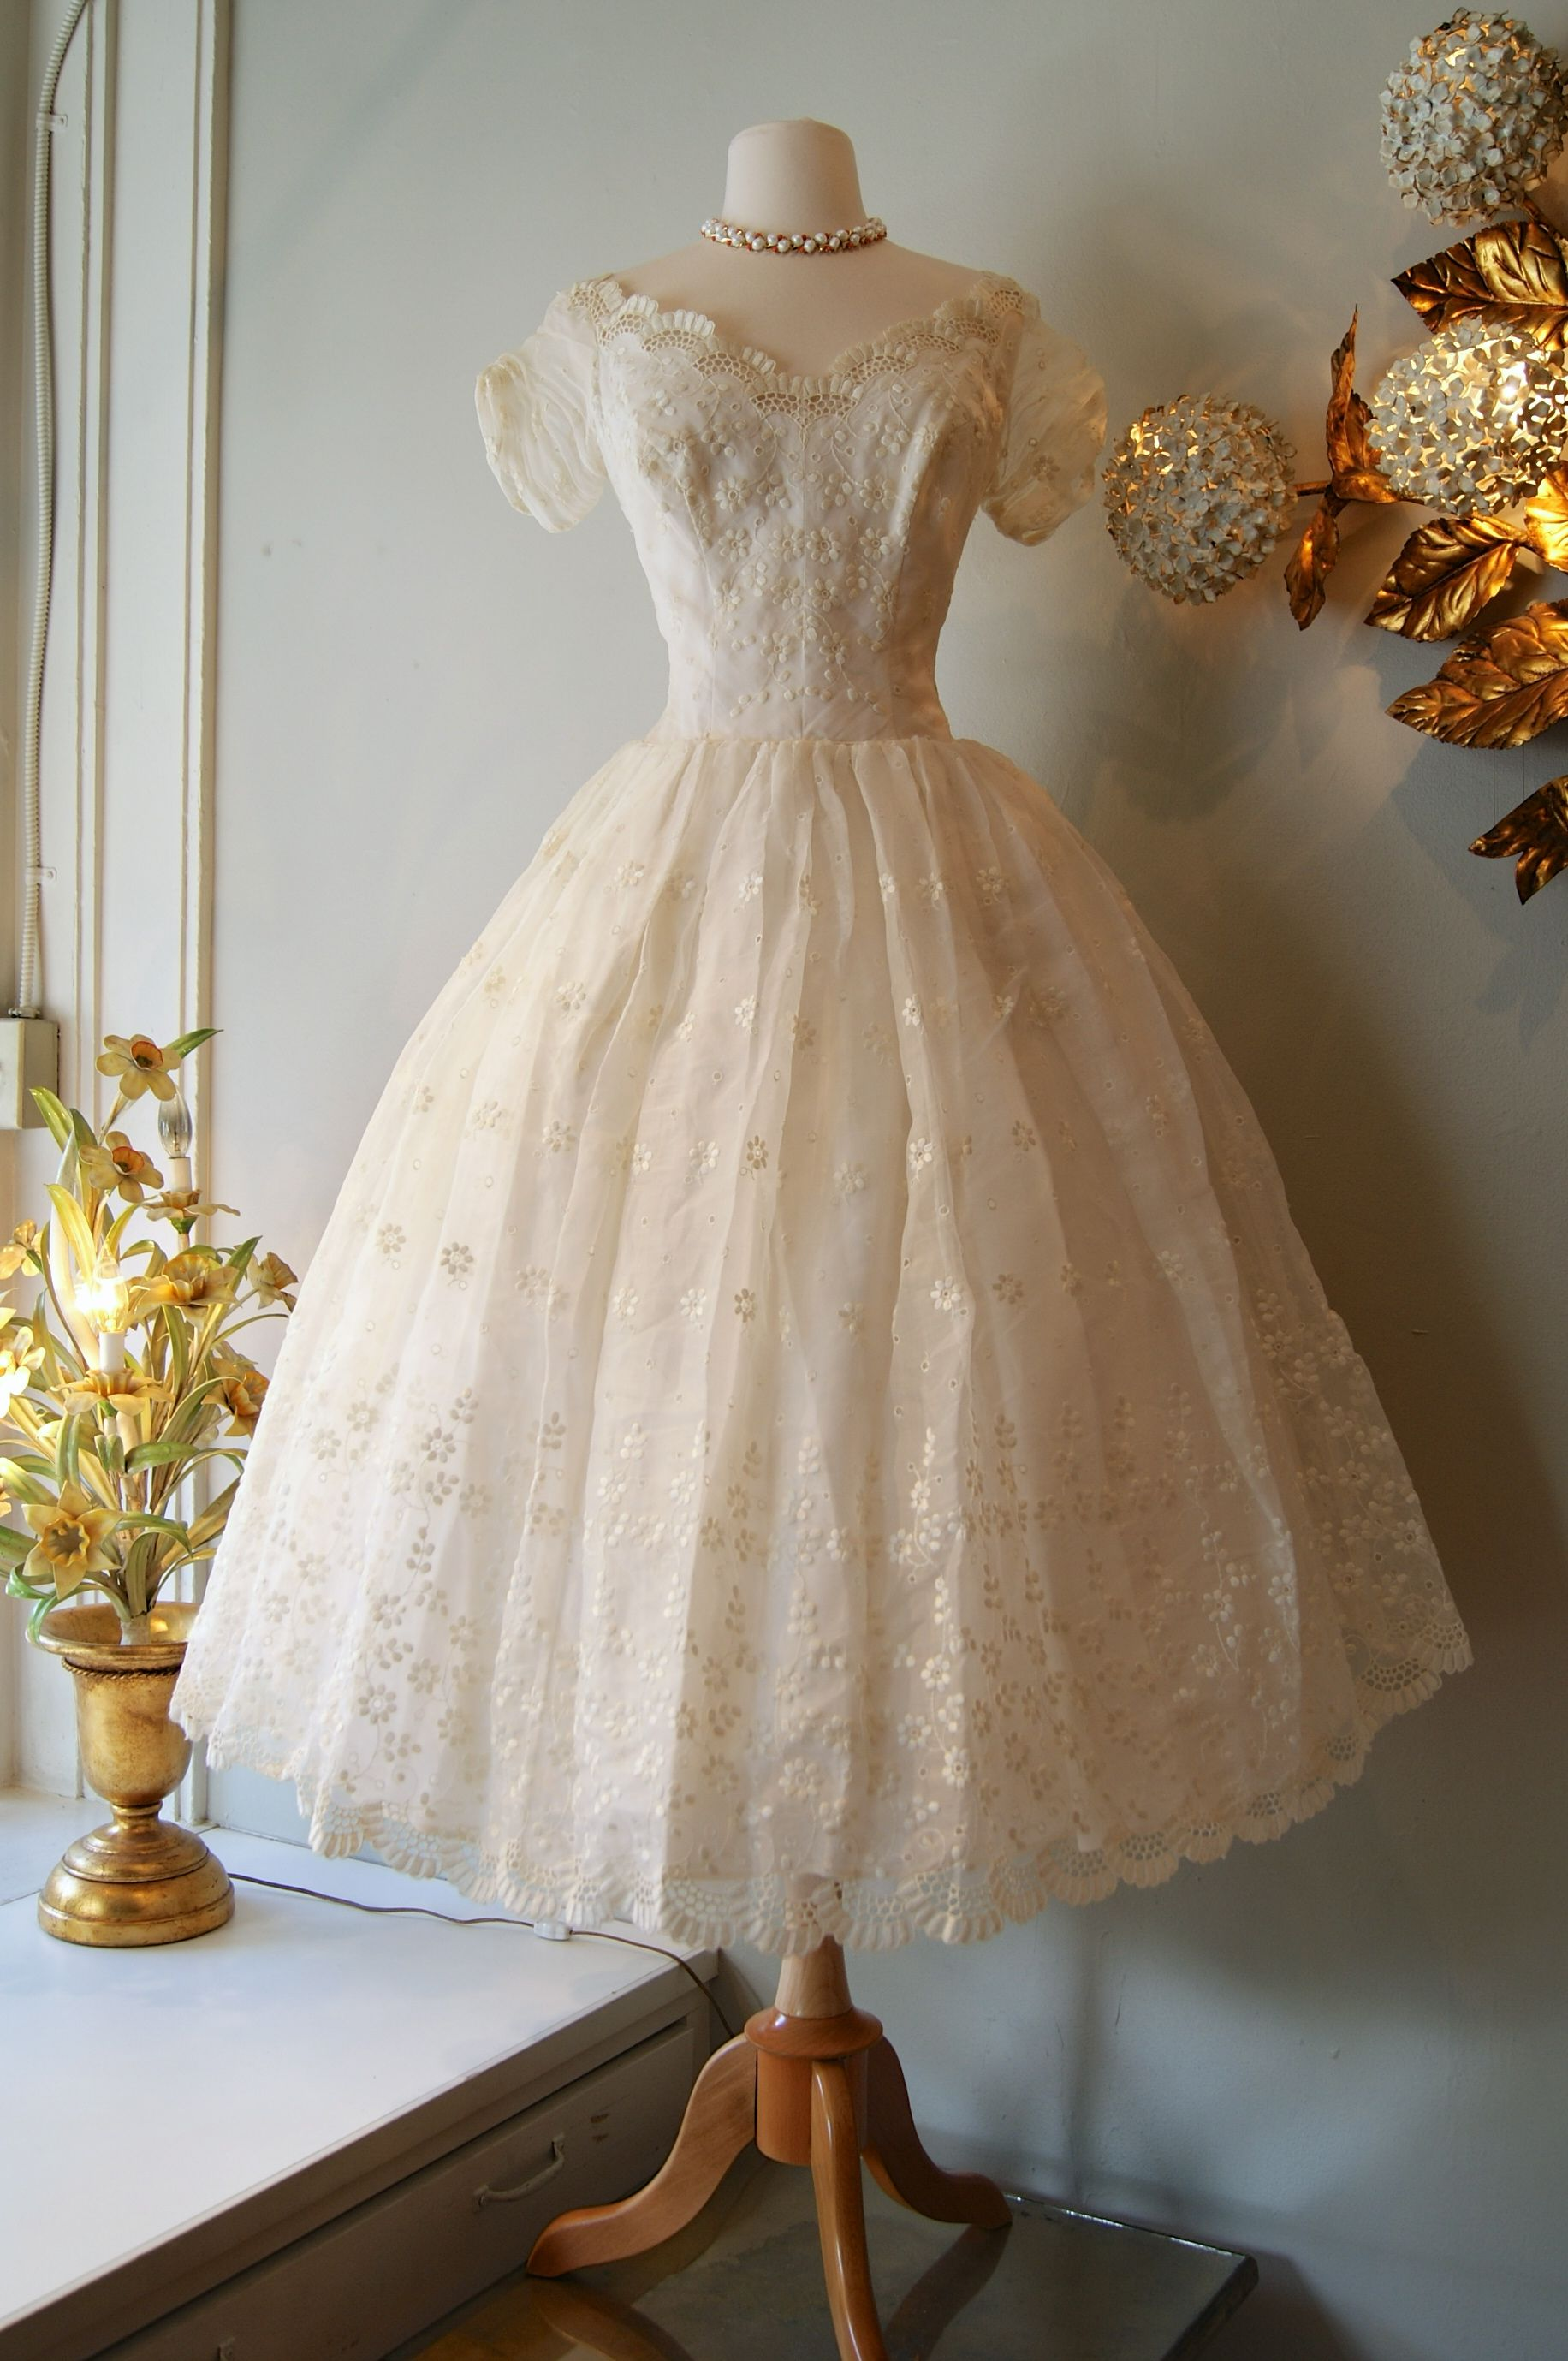 Vintage 1950 S Cotton Eyelet Wedding Dress Available At Xtabay Bridal Salon